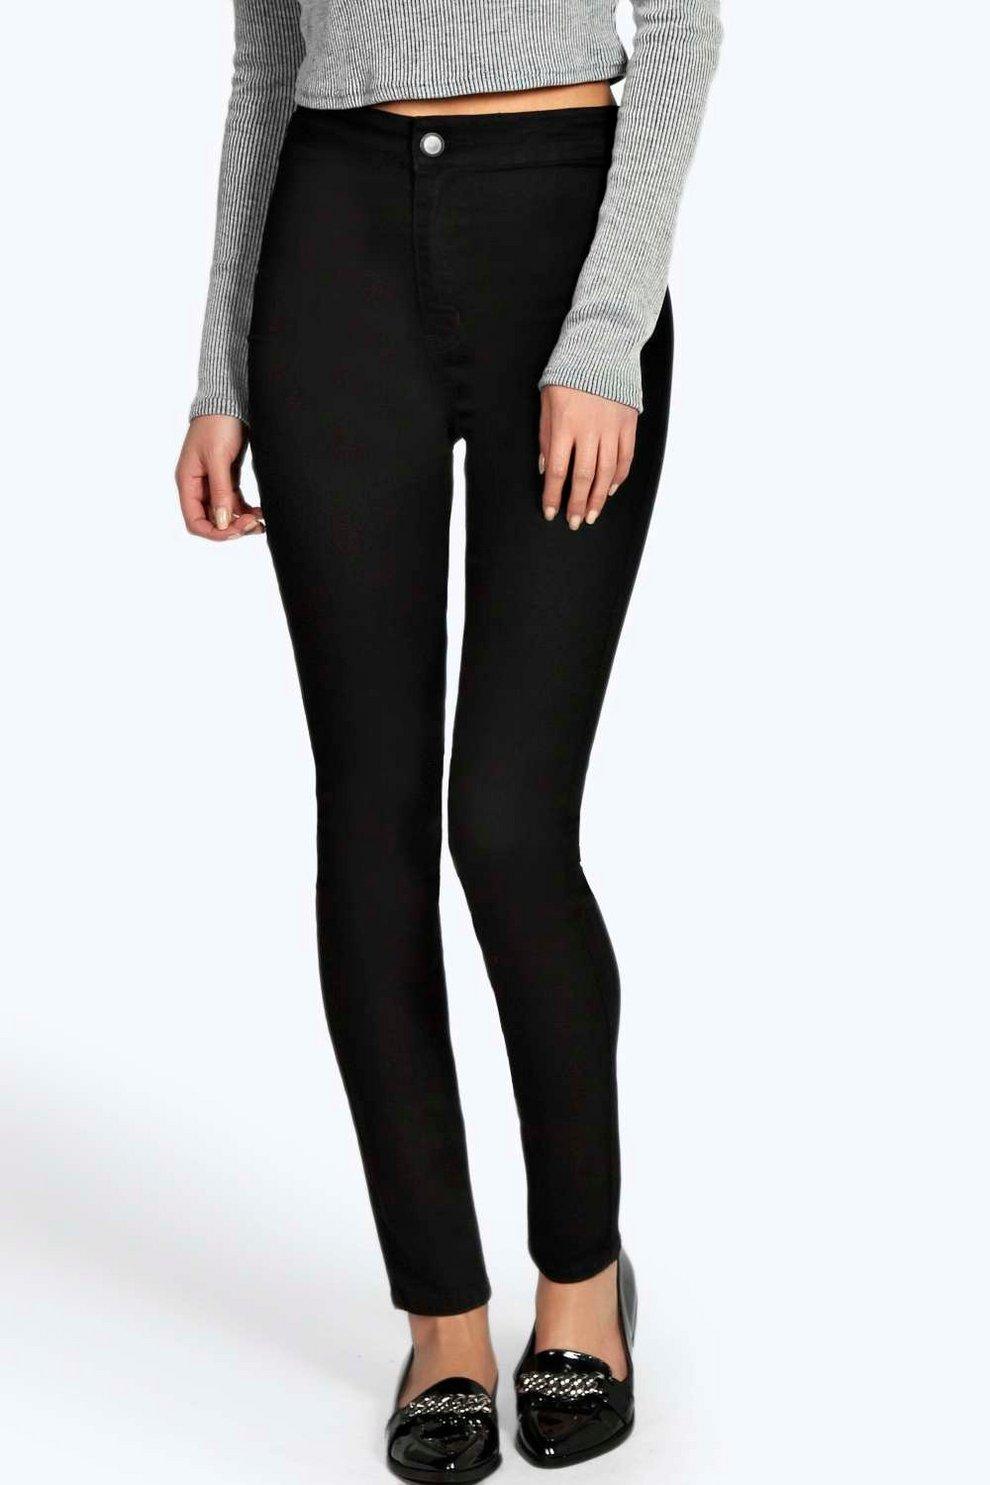 8faa53de873d5 Skinny High Waist Denim Tube Jeans